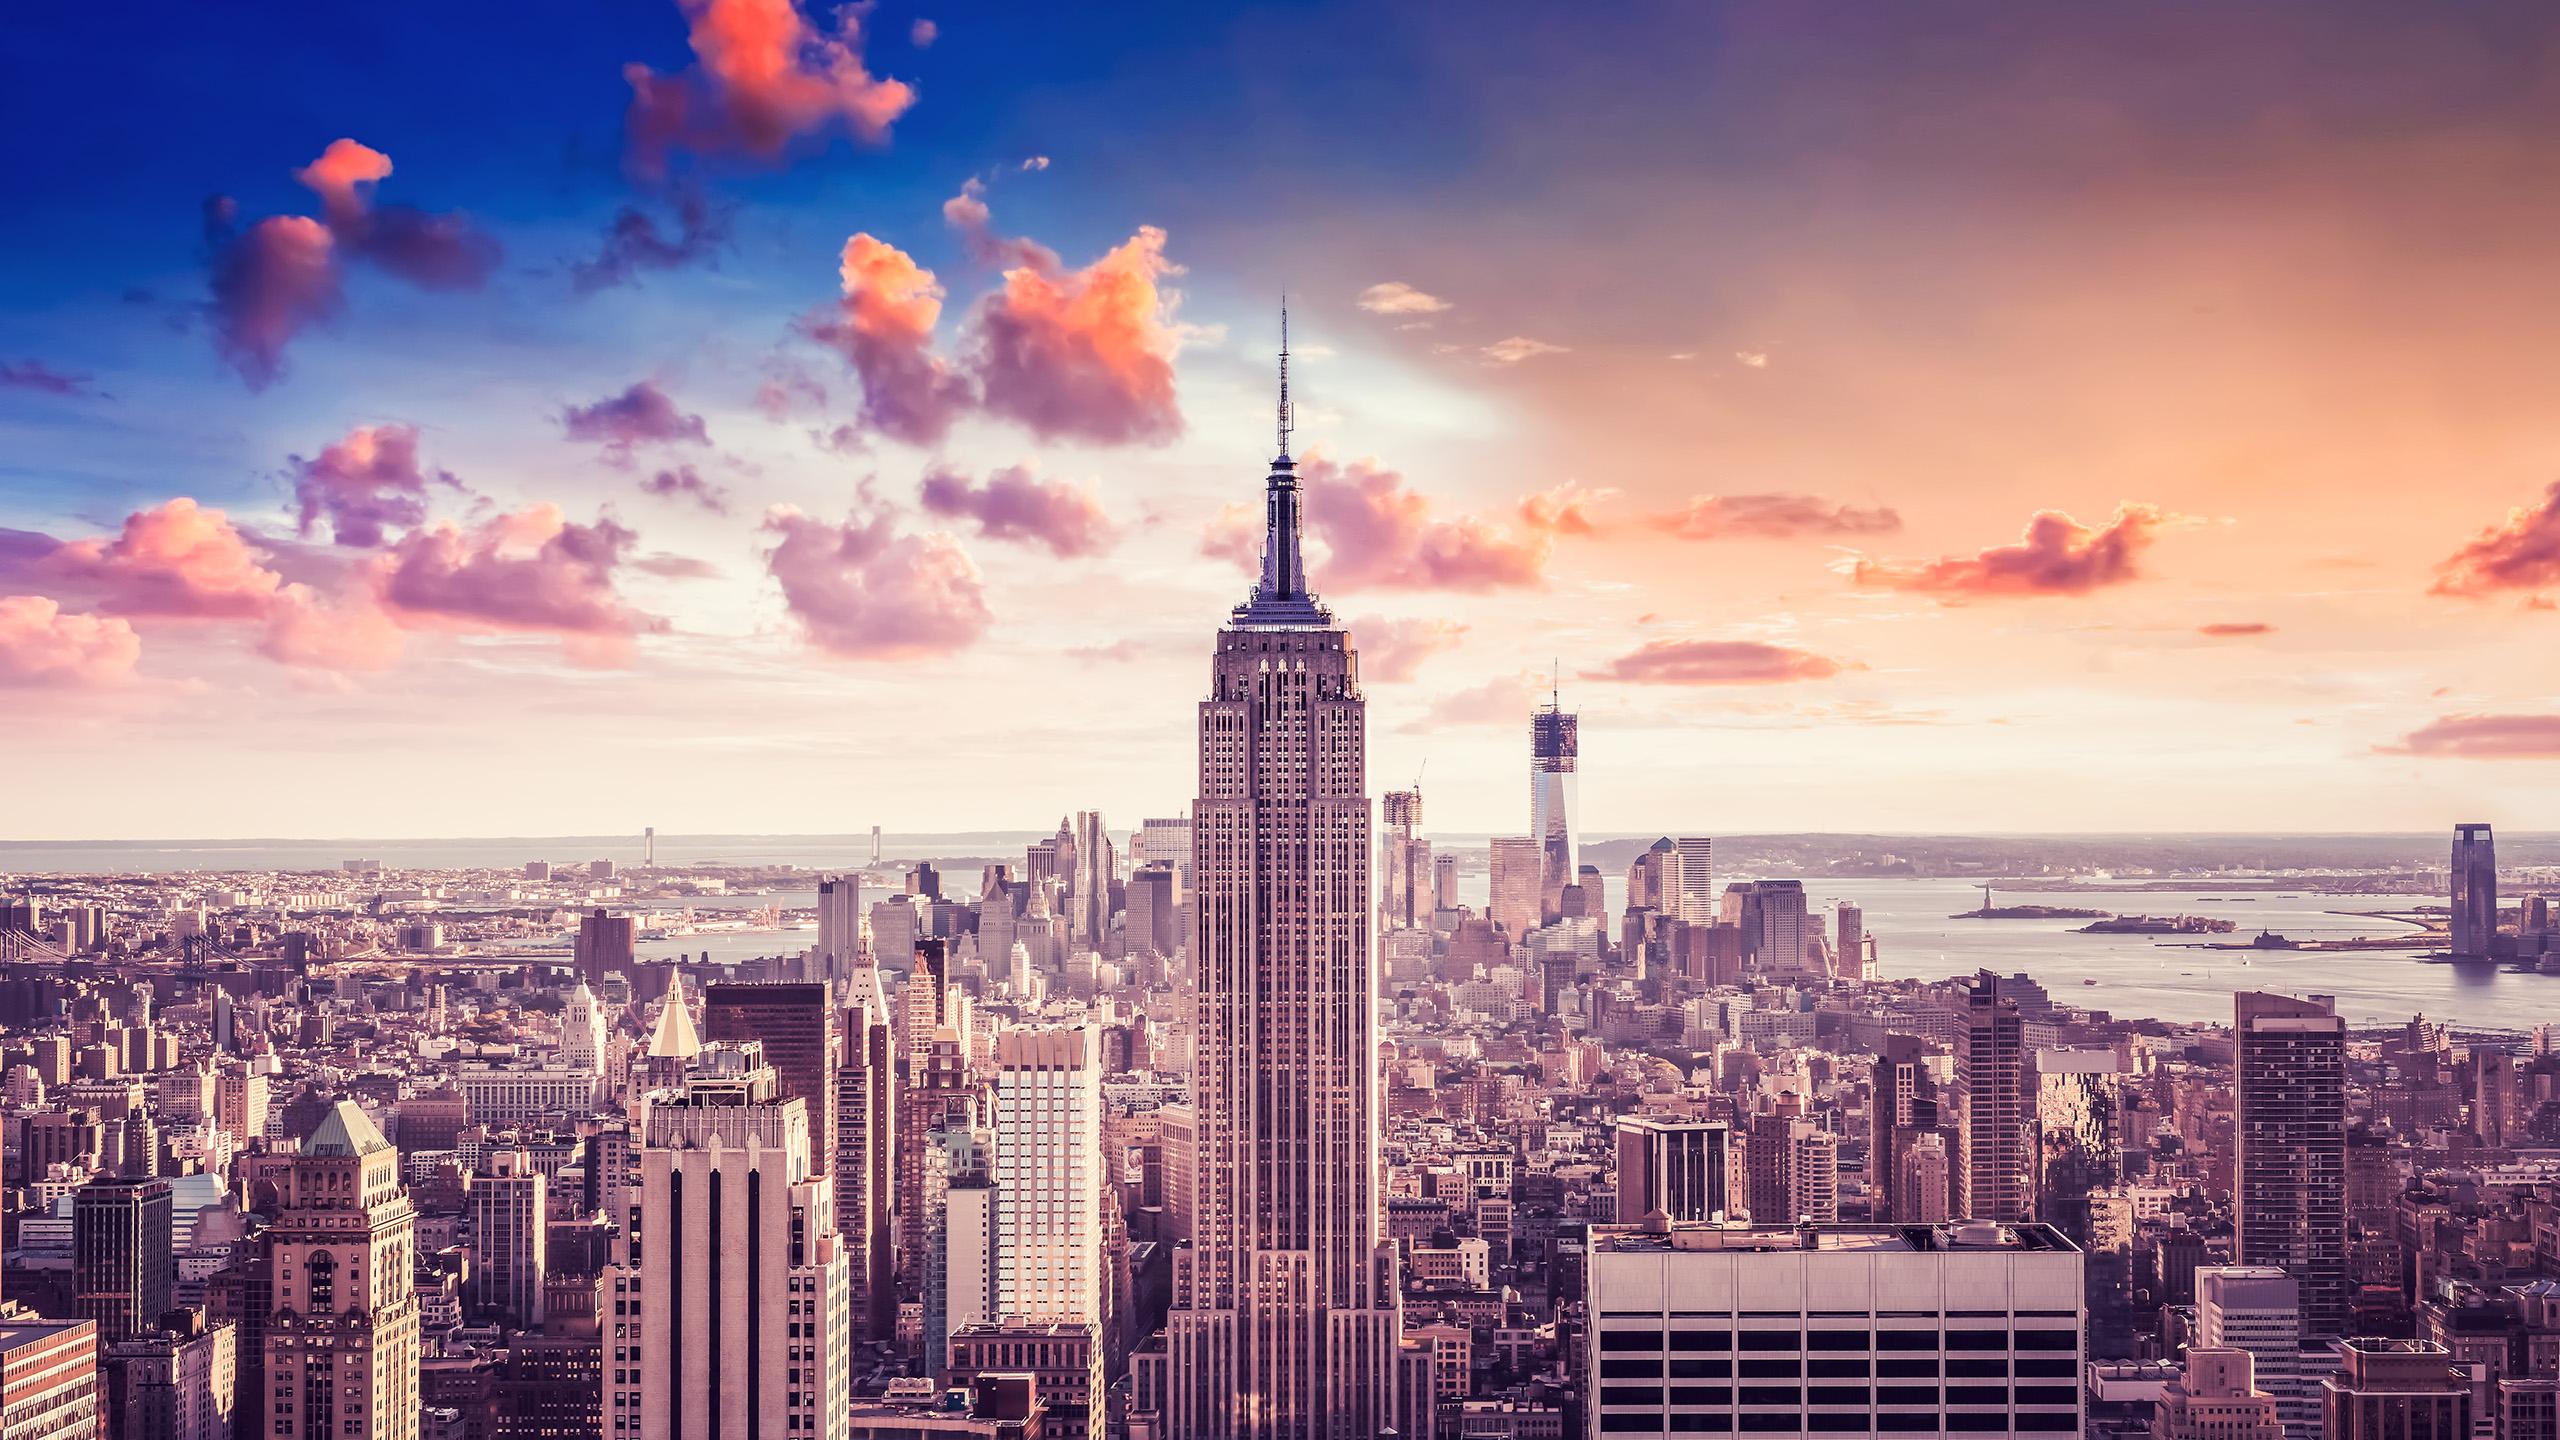 New York Wallpapers Best Wallpapers 2560x1440